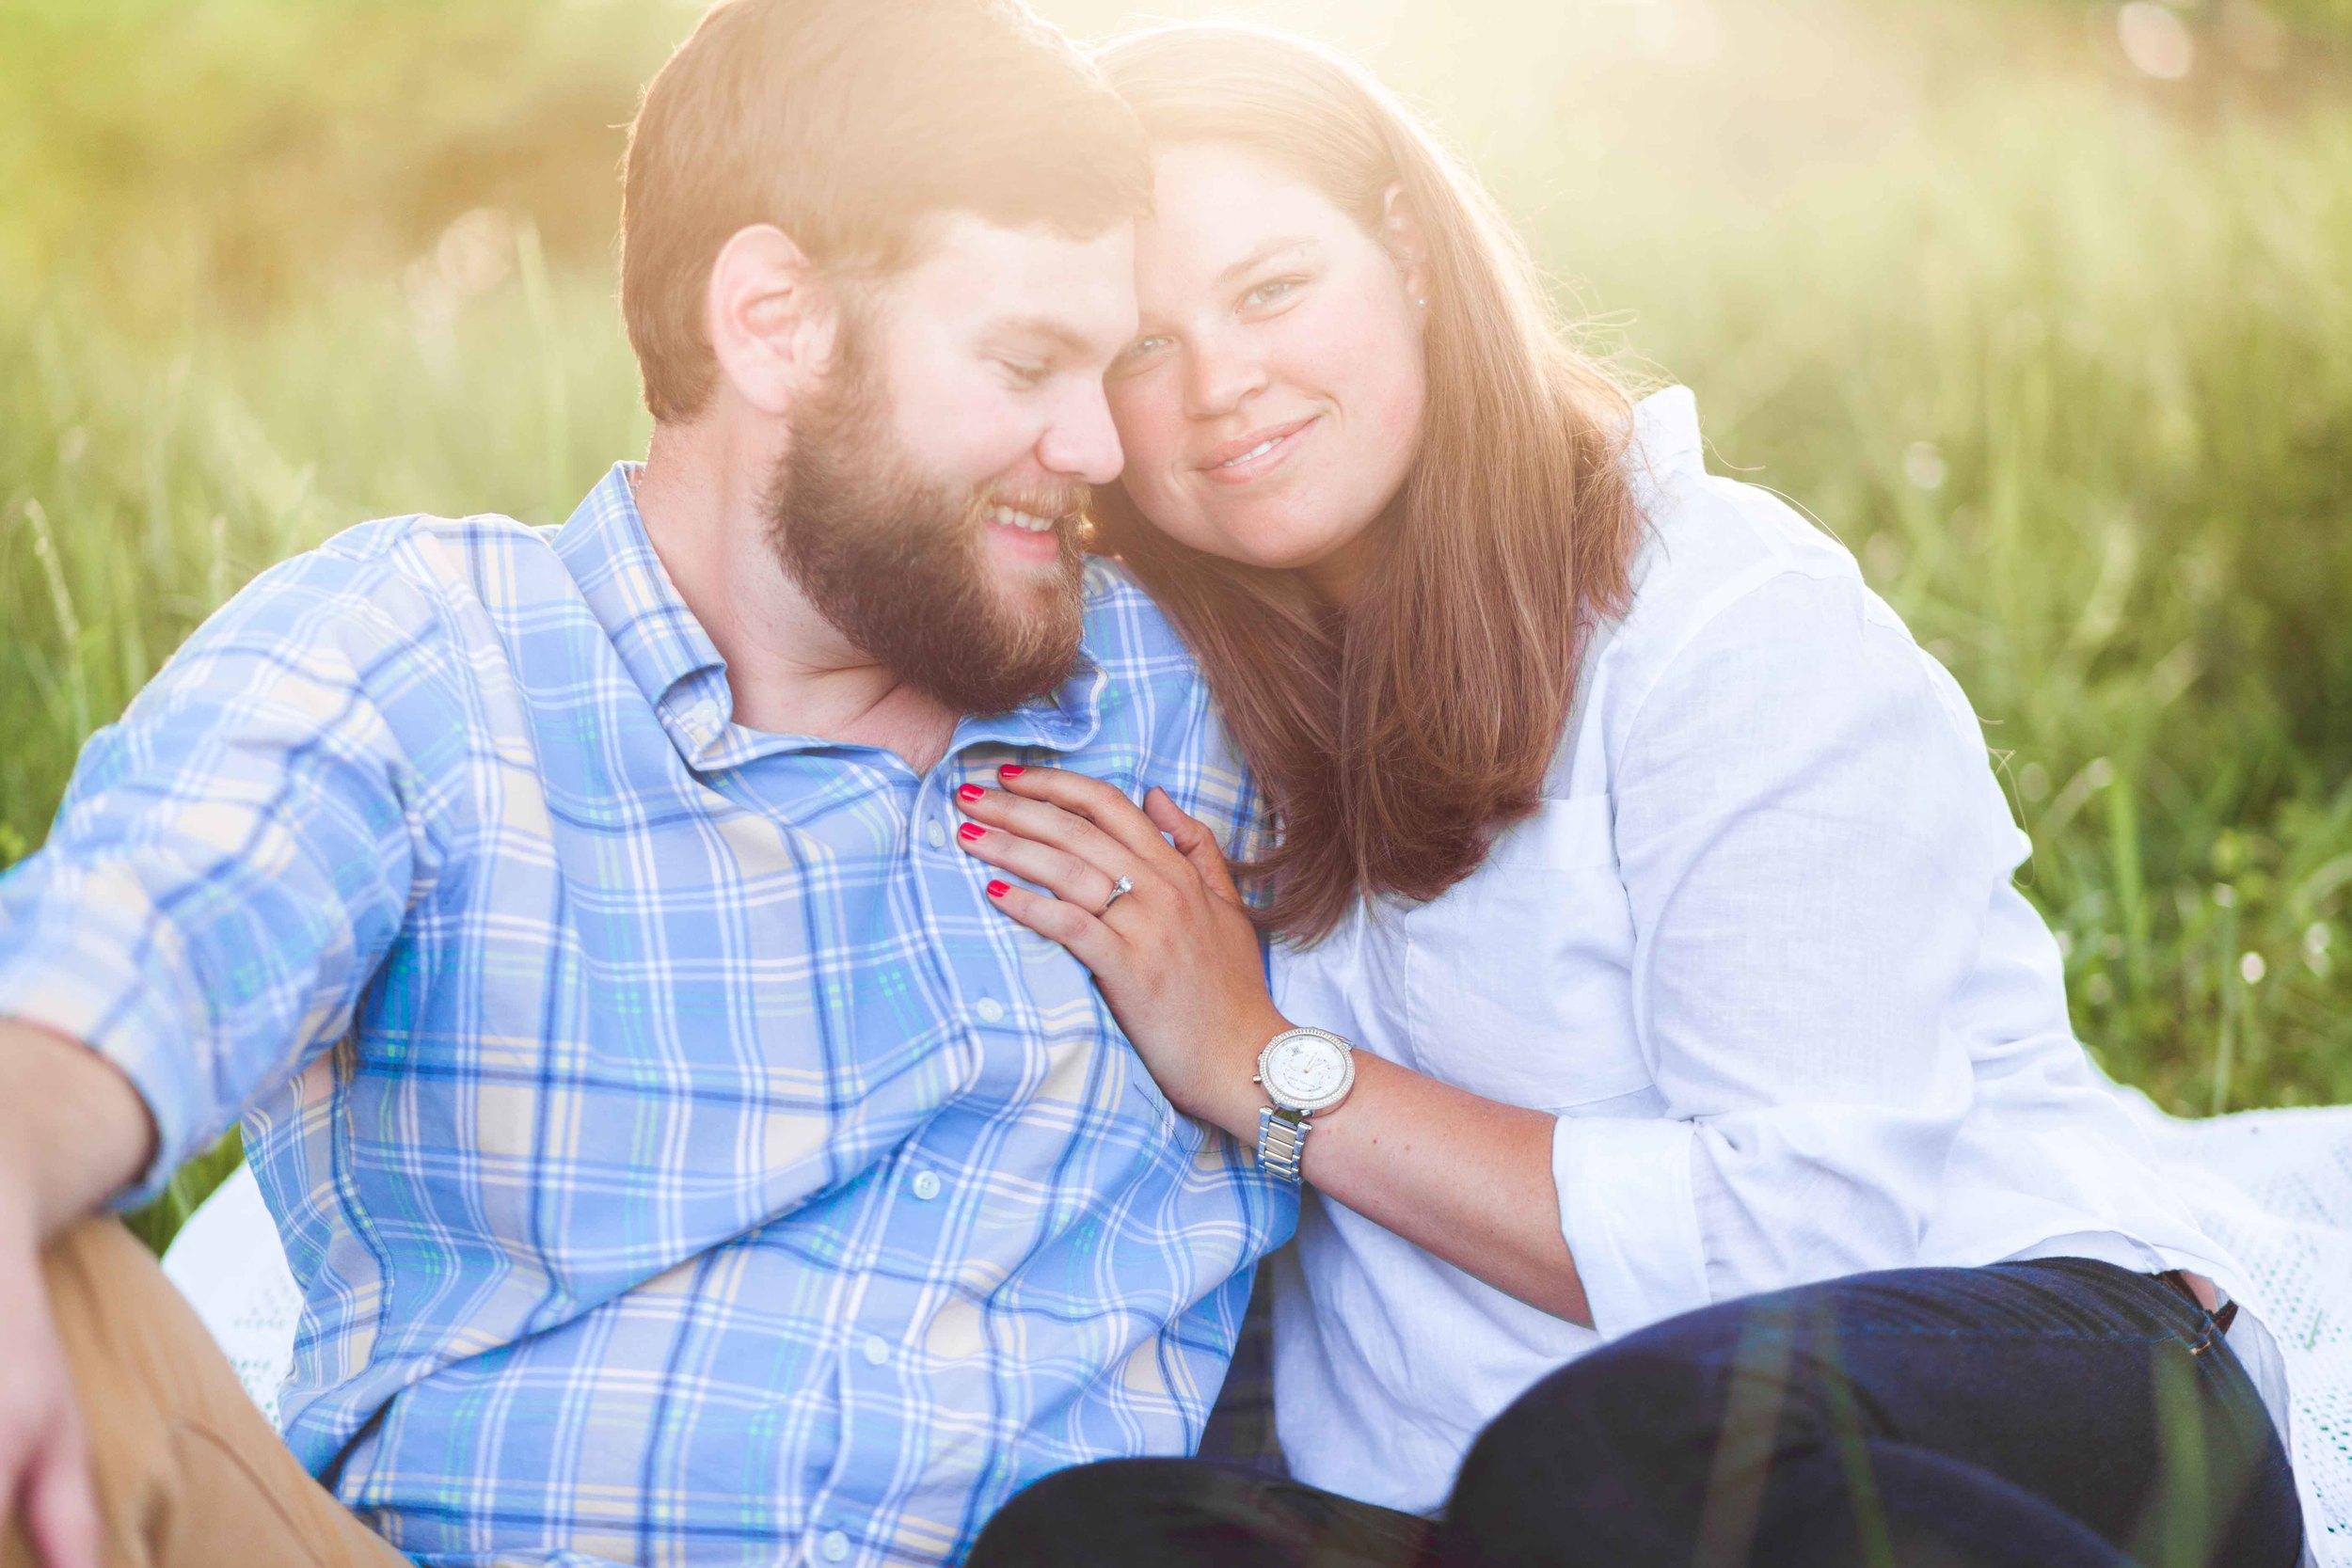 http://www.allisonpedigo.com/journal/2015/4/28/lane-chad-walnut-street-bridge-and-sale-creek-tn-engagement-session-chattanooga-wedding-photographer